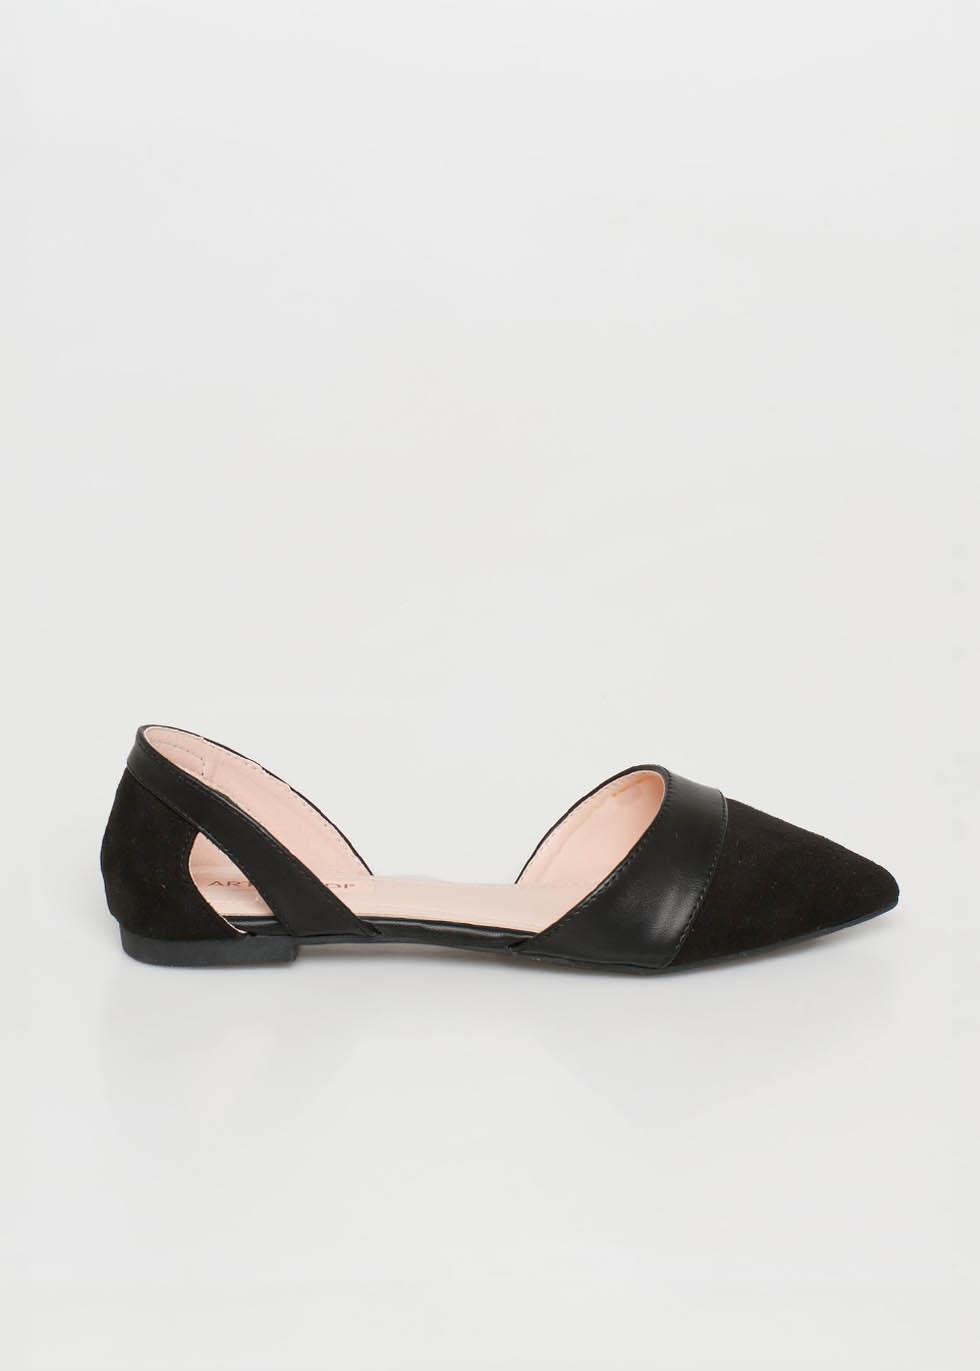 Alice pointed flat shoe, μαύρο γόβες